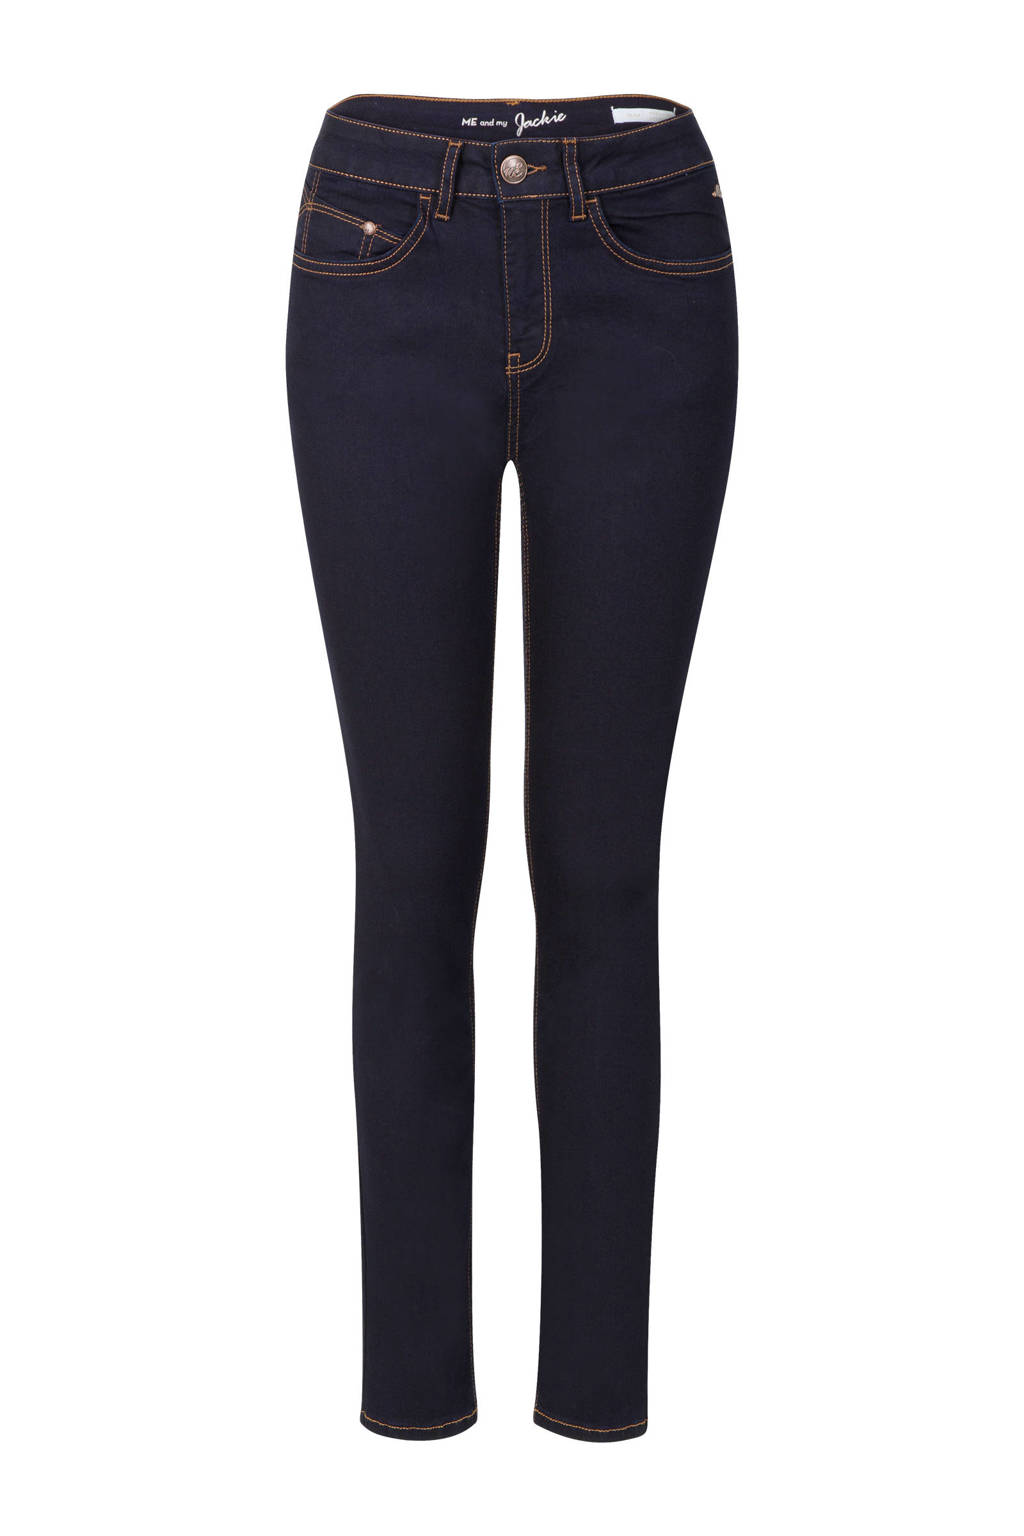 Miss Etam Regulier slim fit jeans 30 inch, Donkerblauw